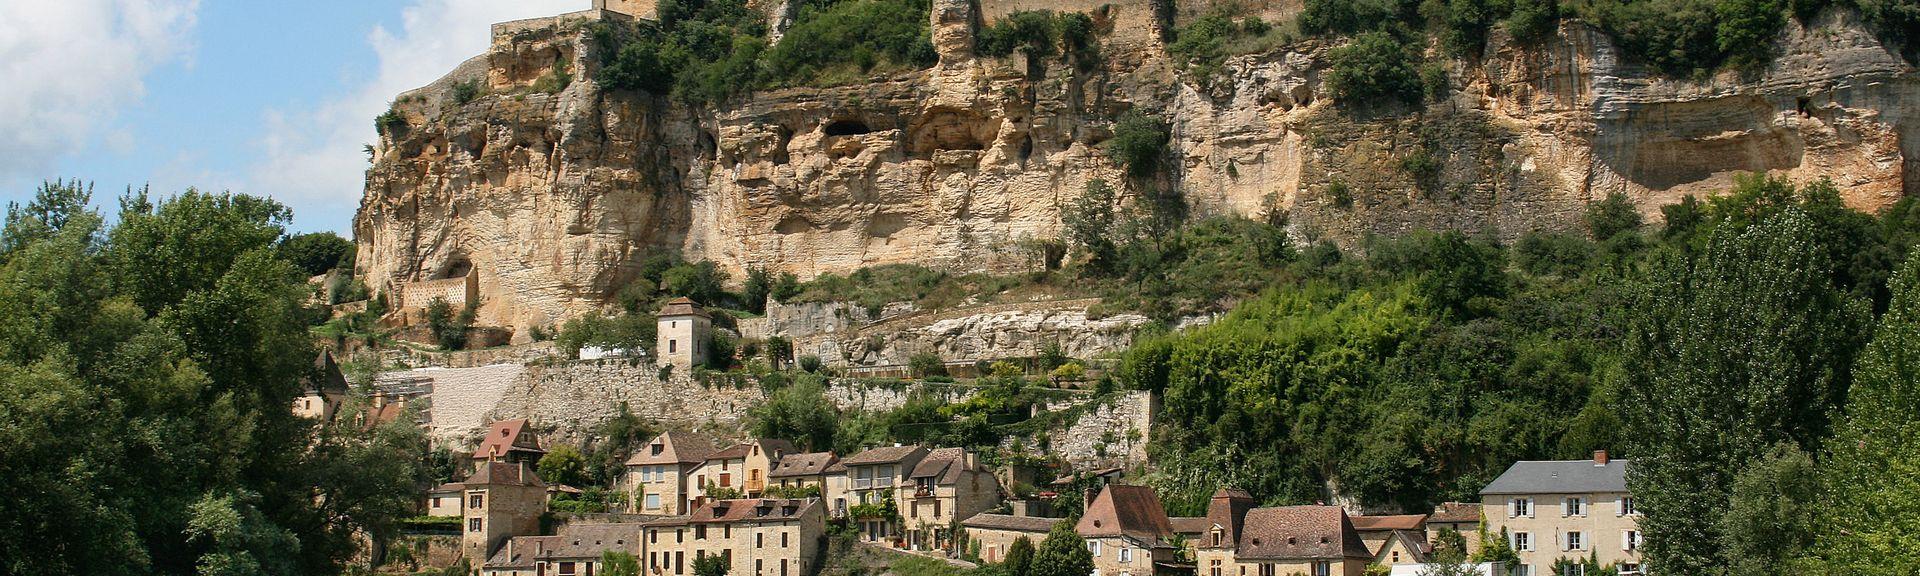 Ardèche, Rhône-Alpes, France